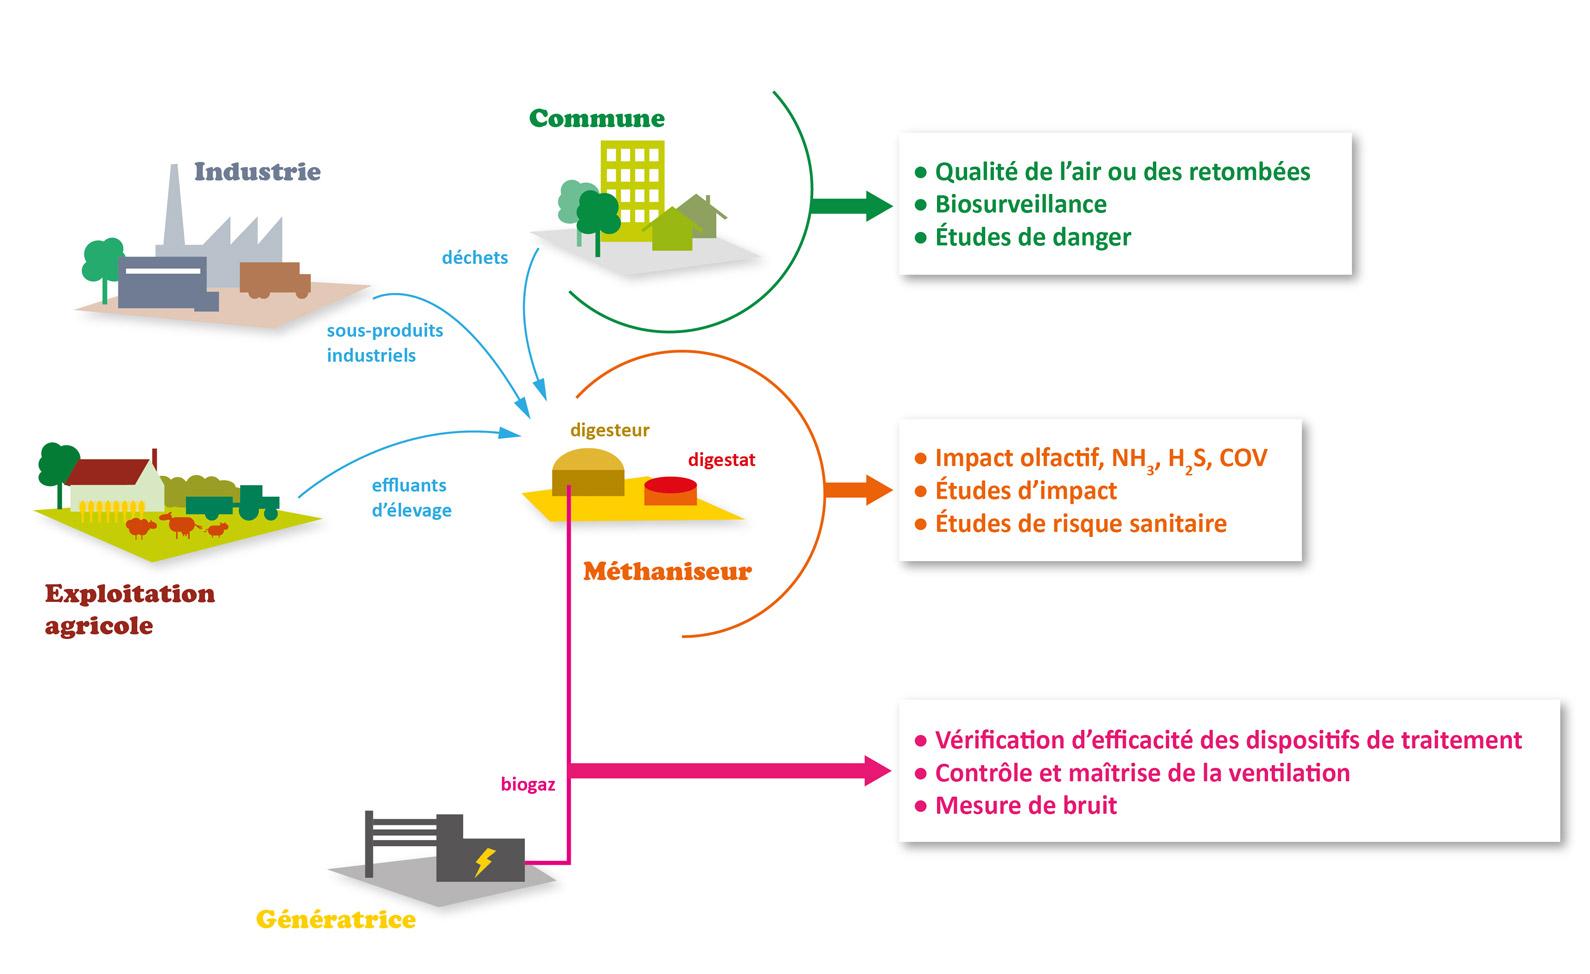 anlayse biogaz impact laboratoire